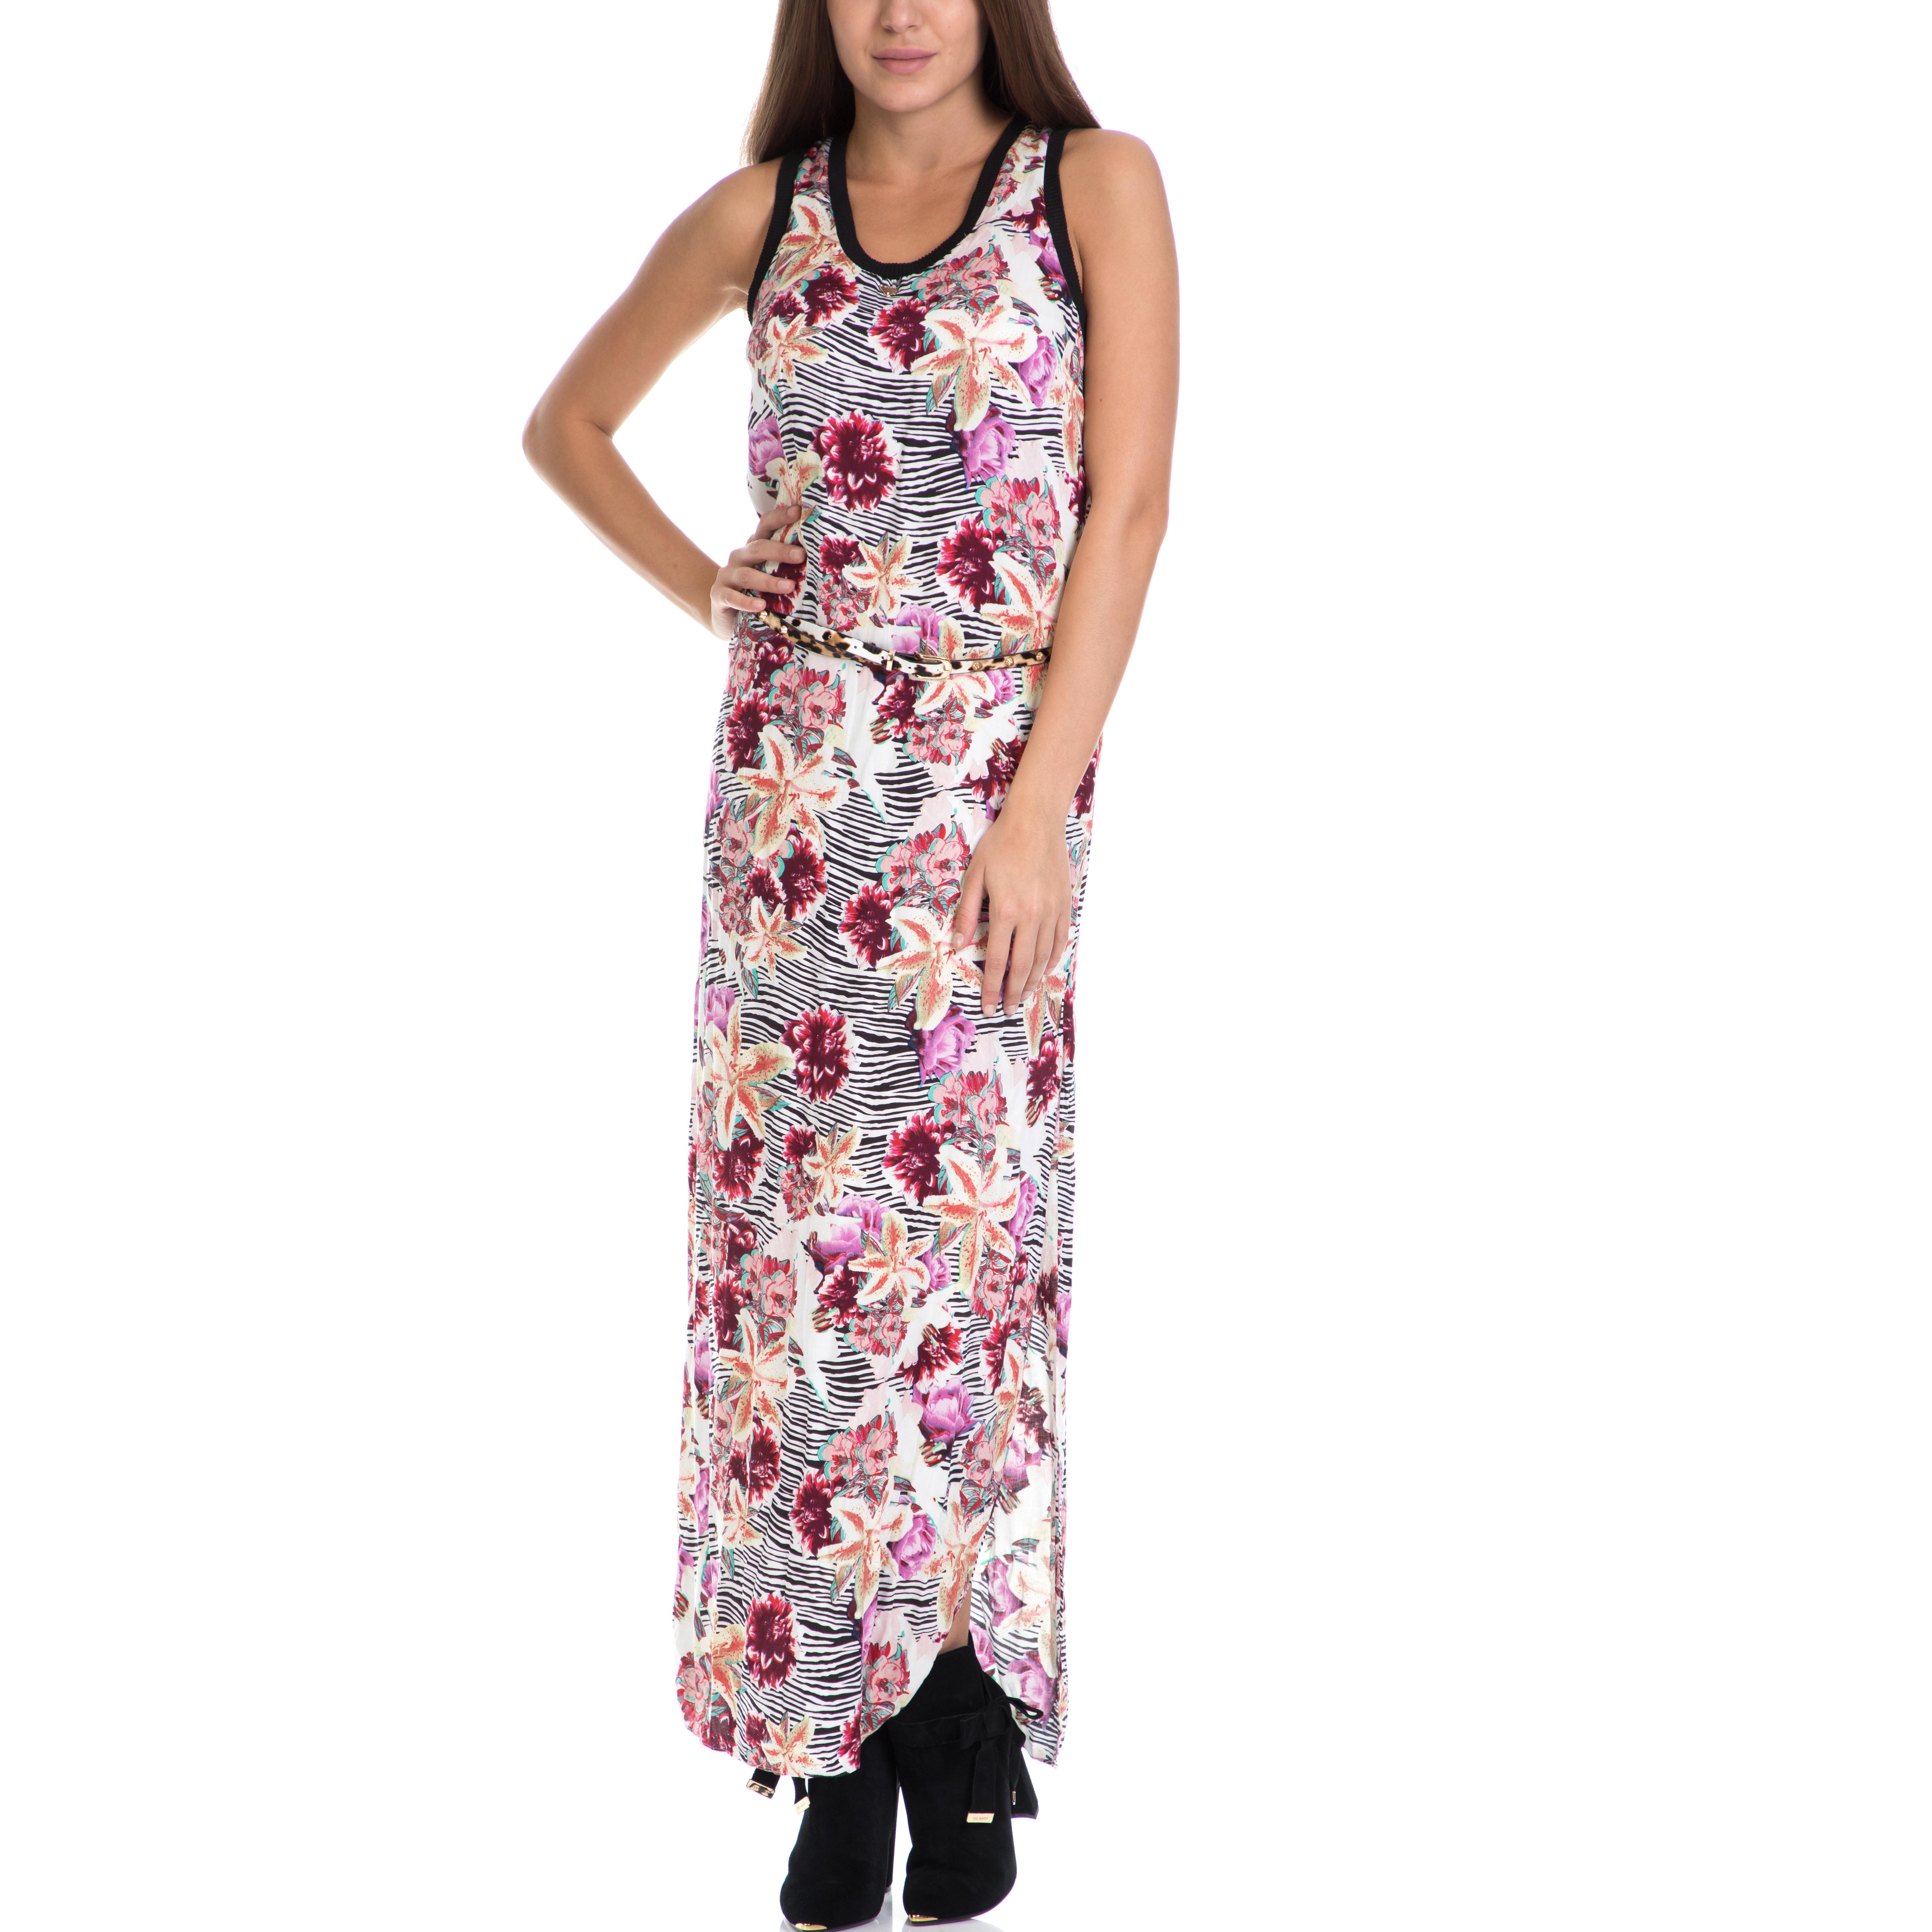 GUESS - Γυναικείο φόρεμα AGRIPPINA GUESS εμπριμέ γυναικεία ρούχα φορέματα μάξι